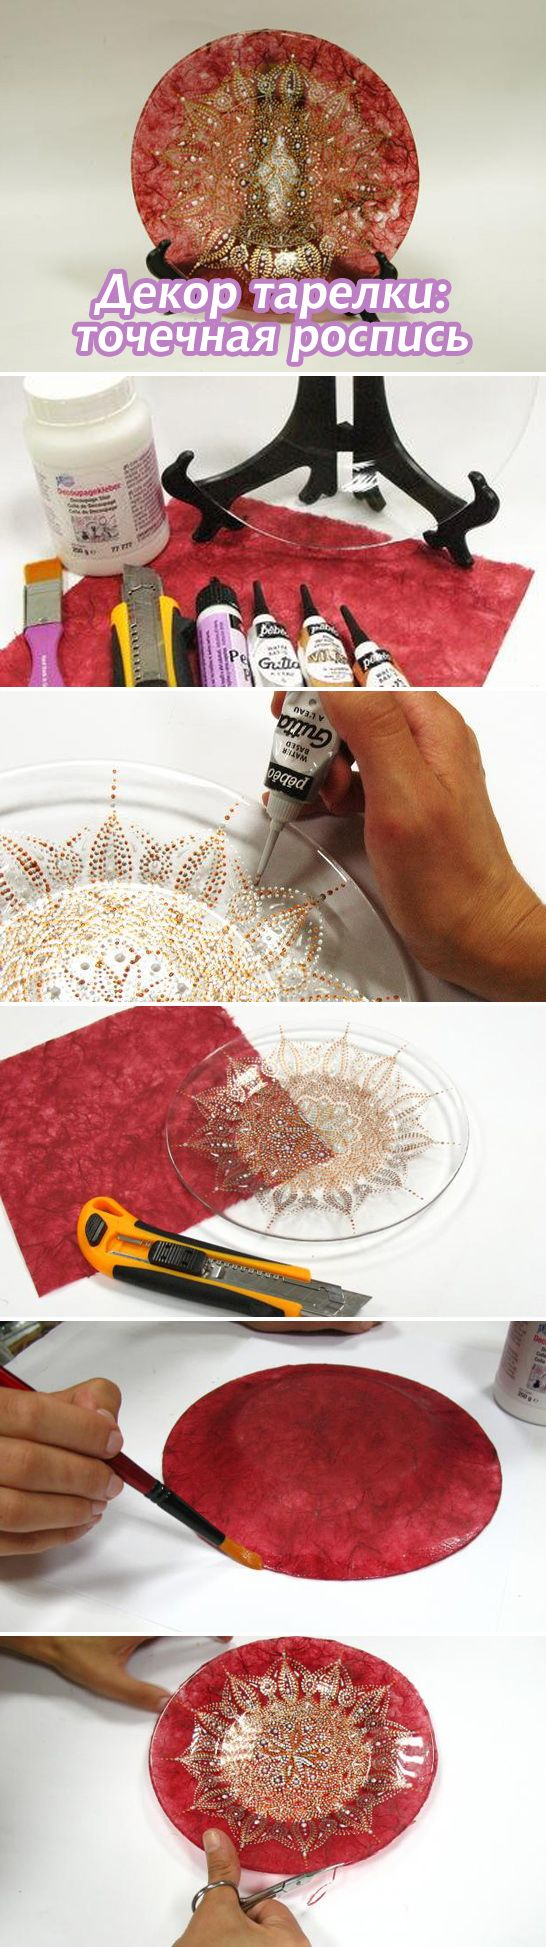 Декорируем тарелку в технике точечной росписи / Decorate Plate (point-to-point) Tutorial #diy #decor #handmade #painting #pointtopoint